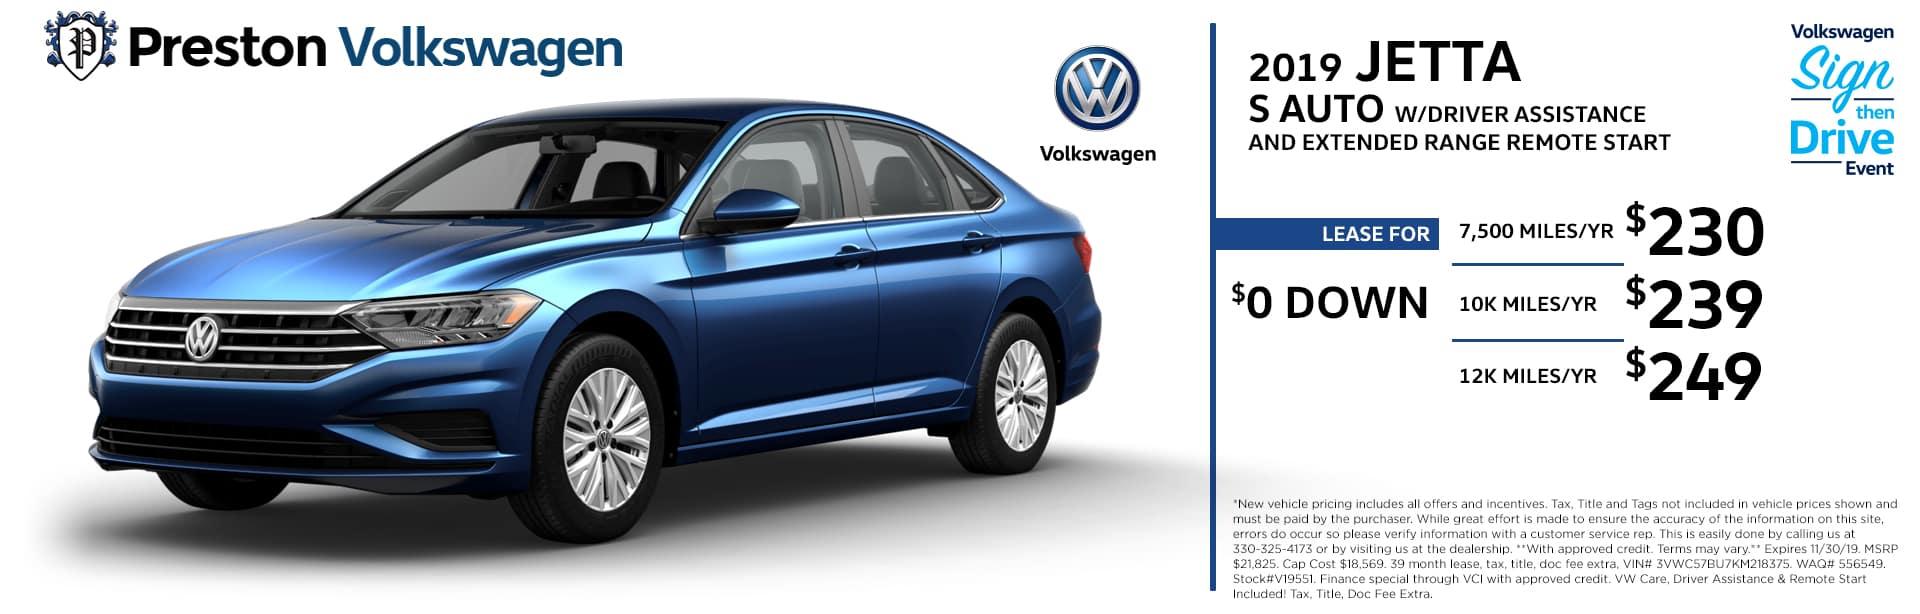 Volkswagen Of Boardman Auto Dealership Sales Service